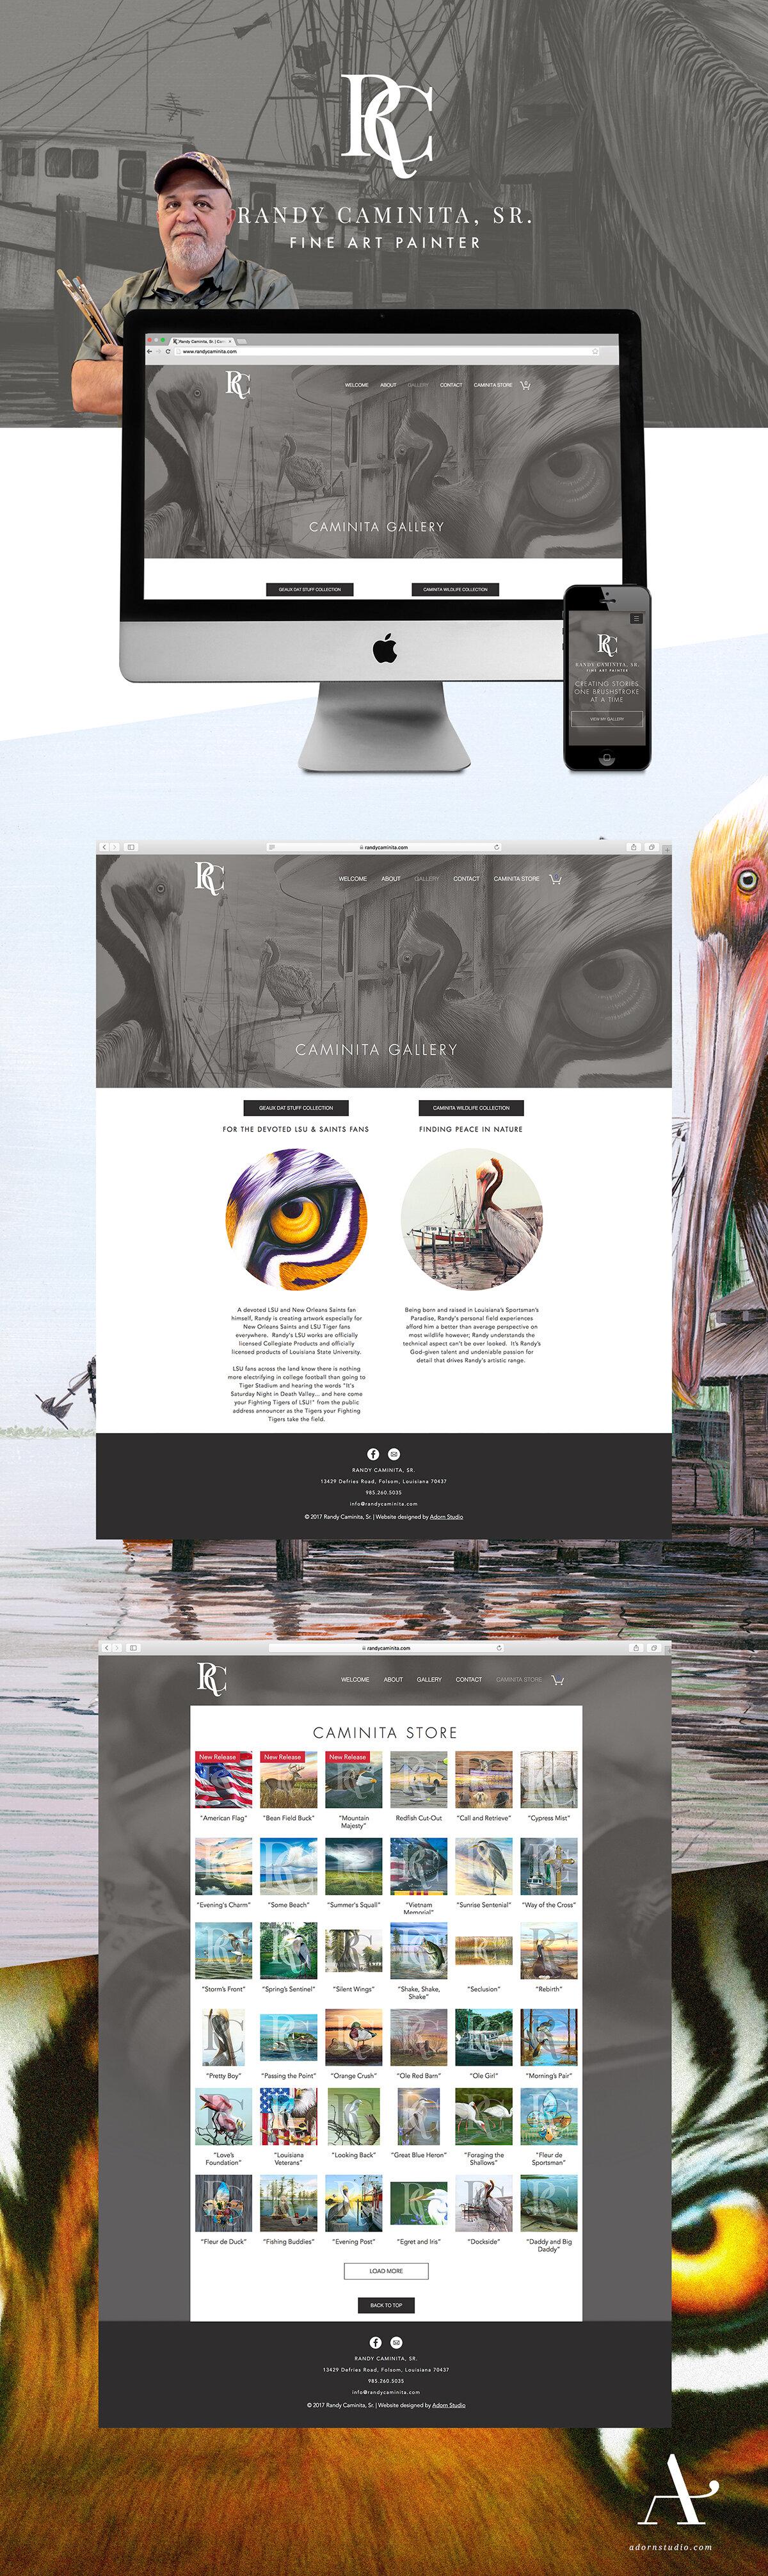 Adorn Studio | Responsive Web Design | Randy Caminita, Sr. | Fine Art Painter